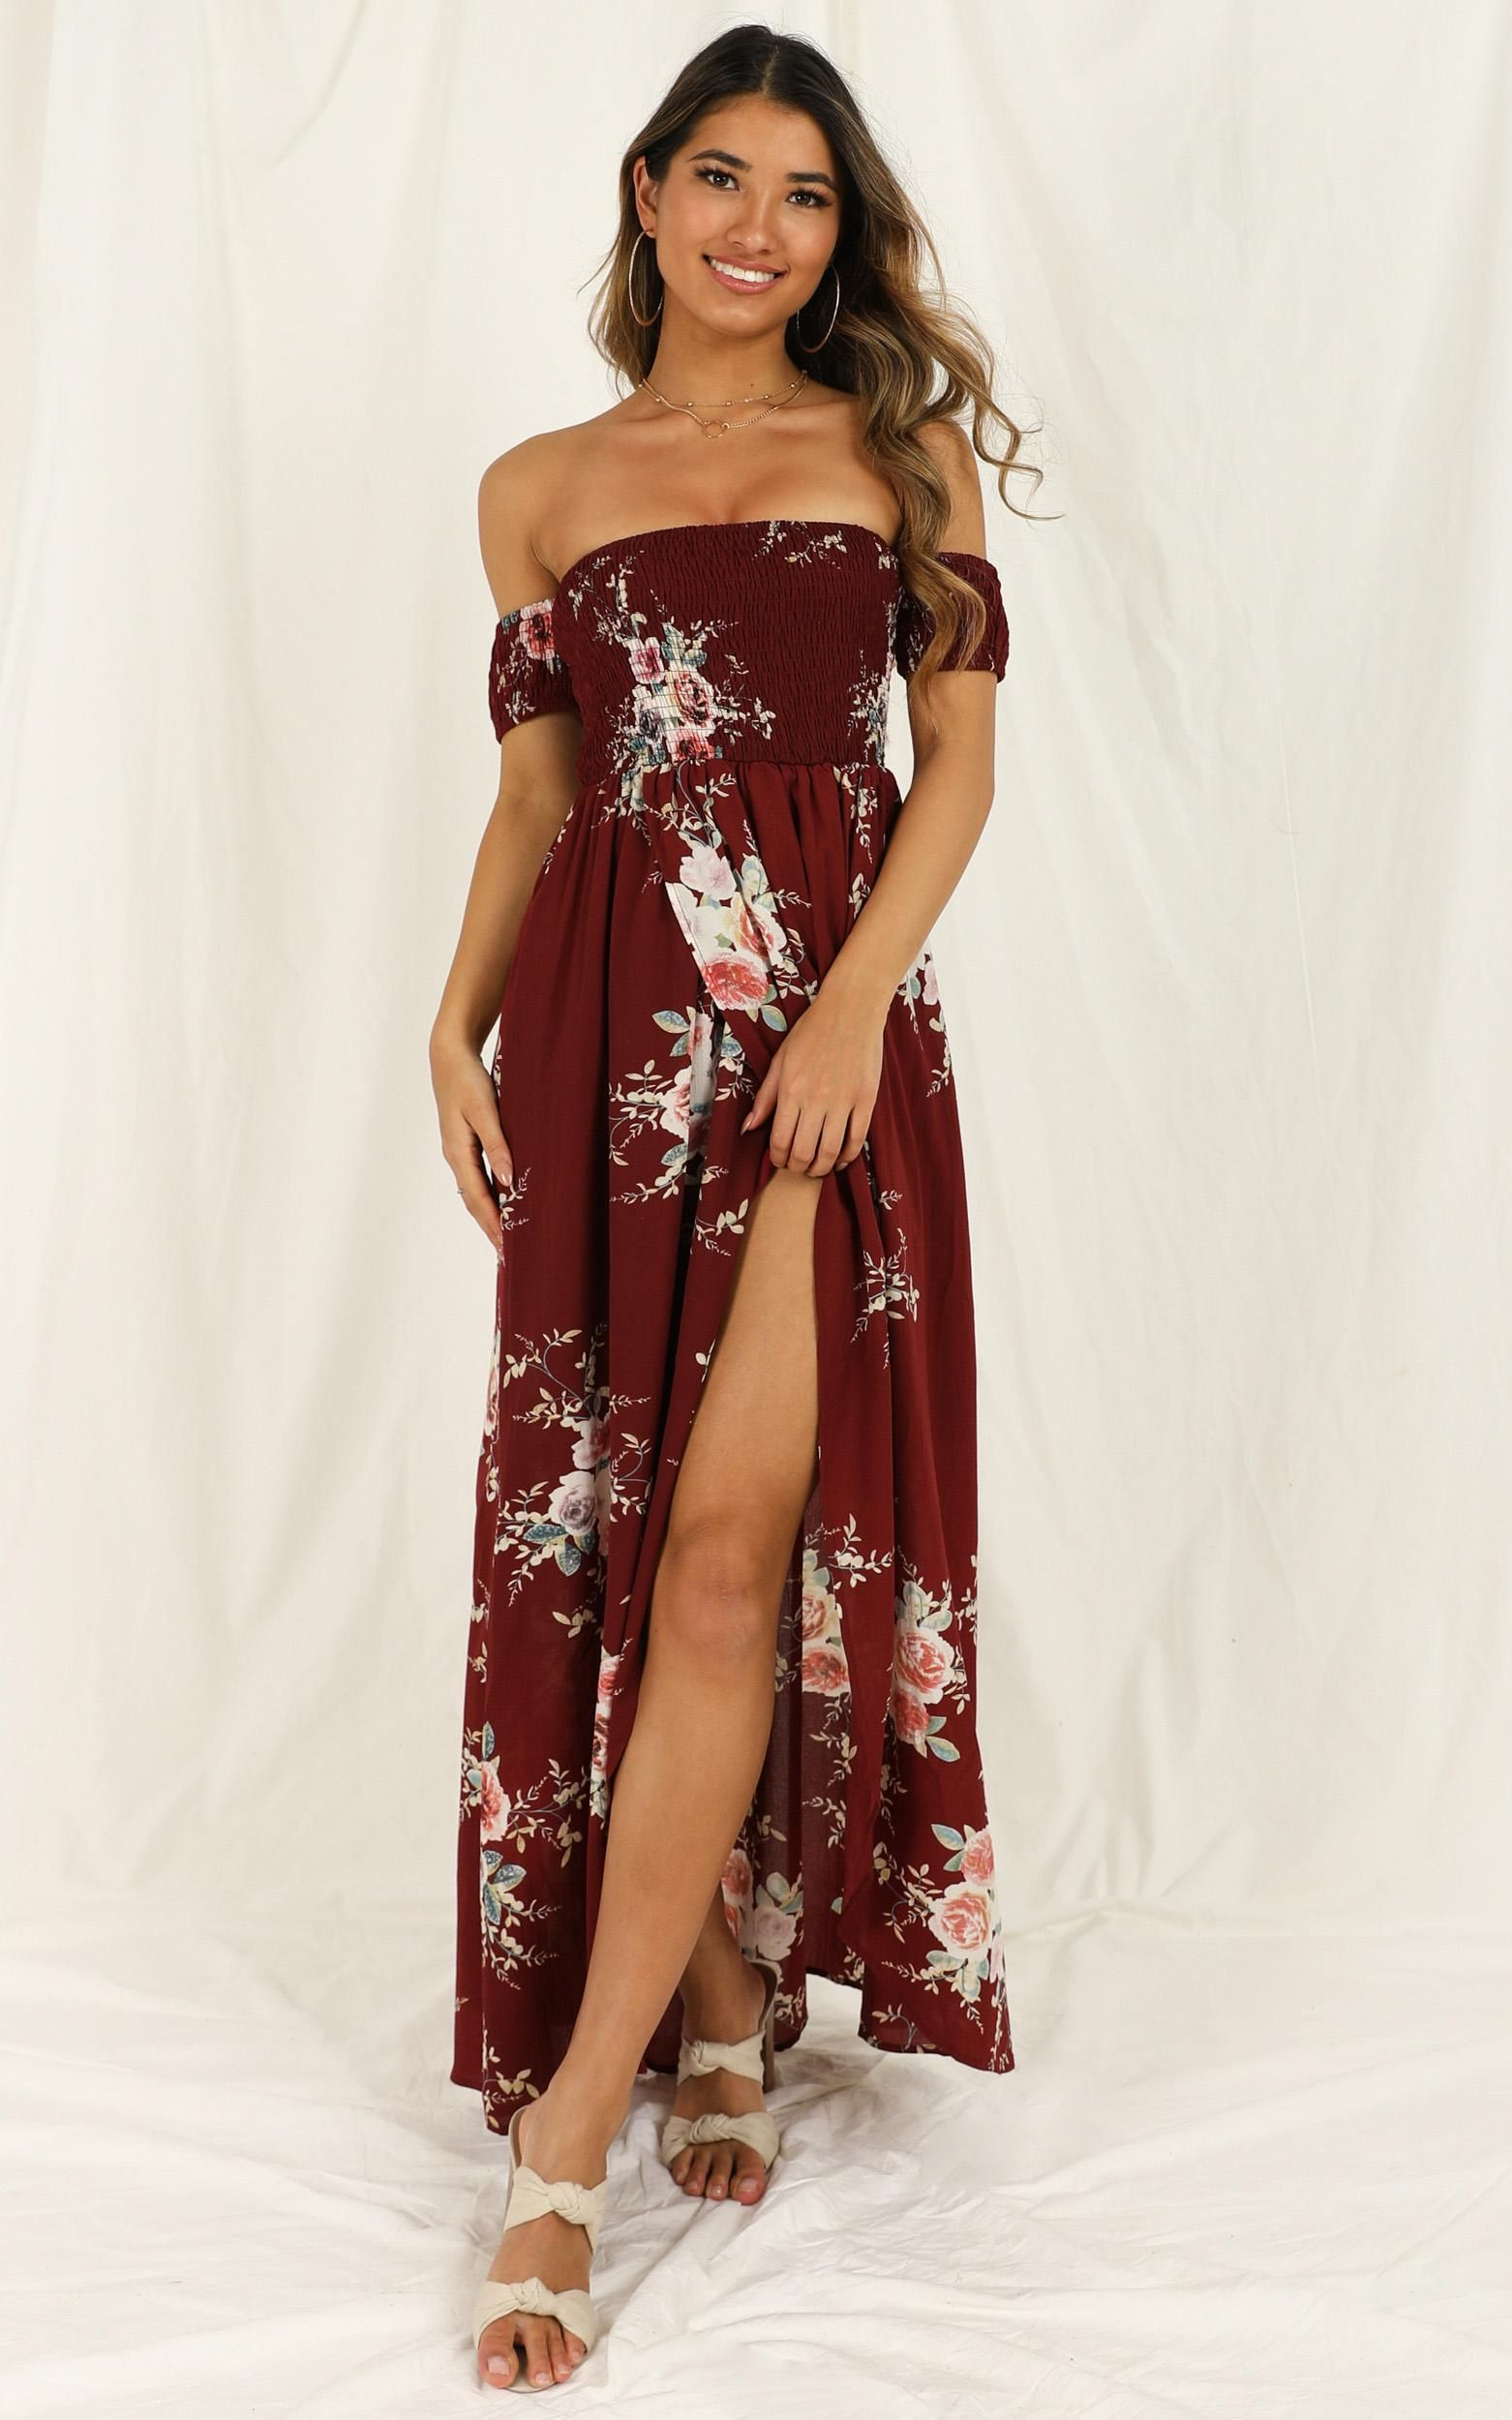 Lovestruck Maxi Dress In Wine Floral Showpo in 2020